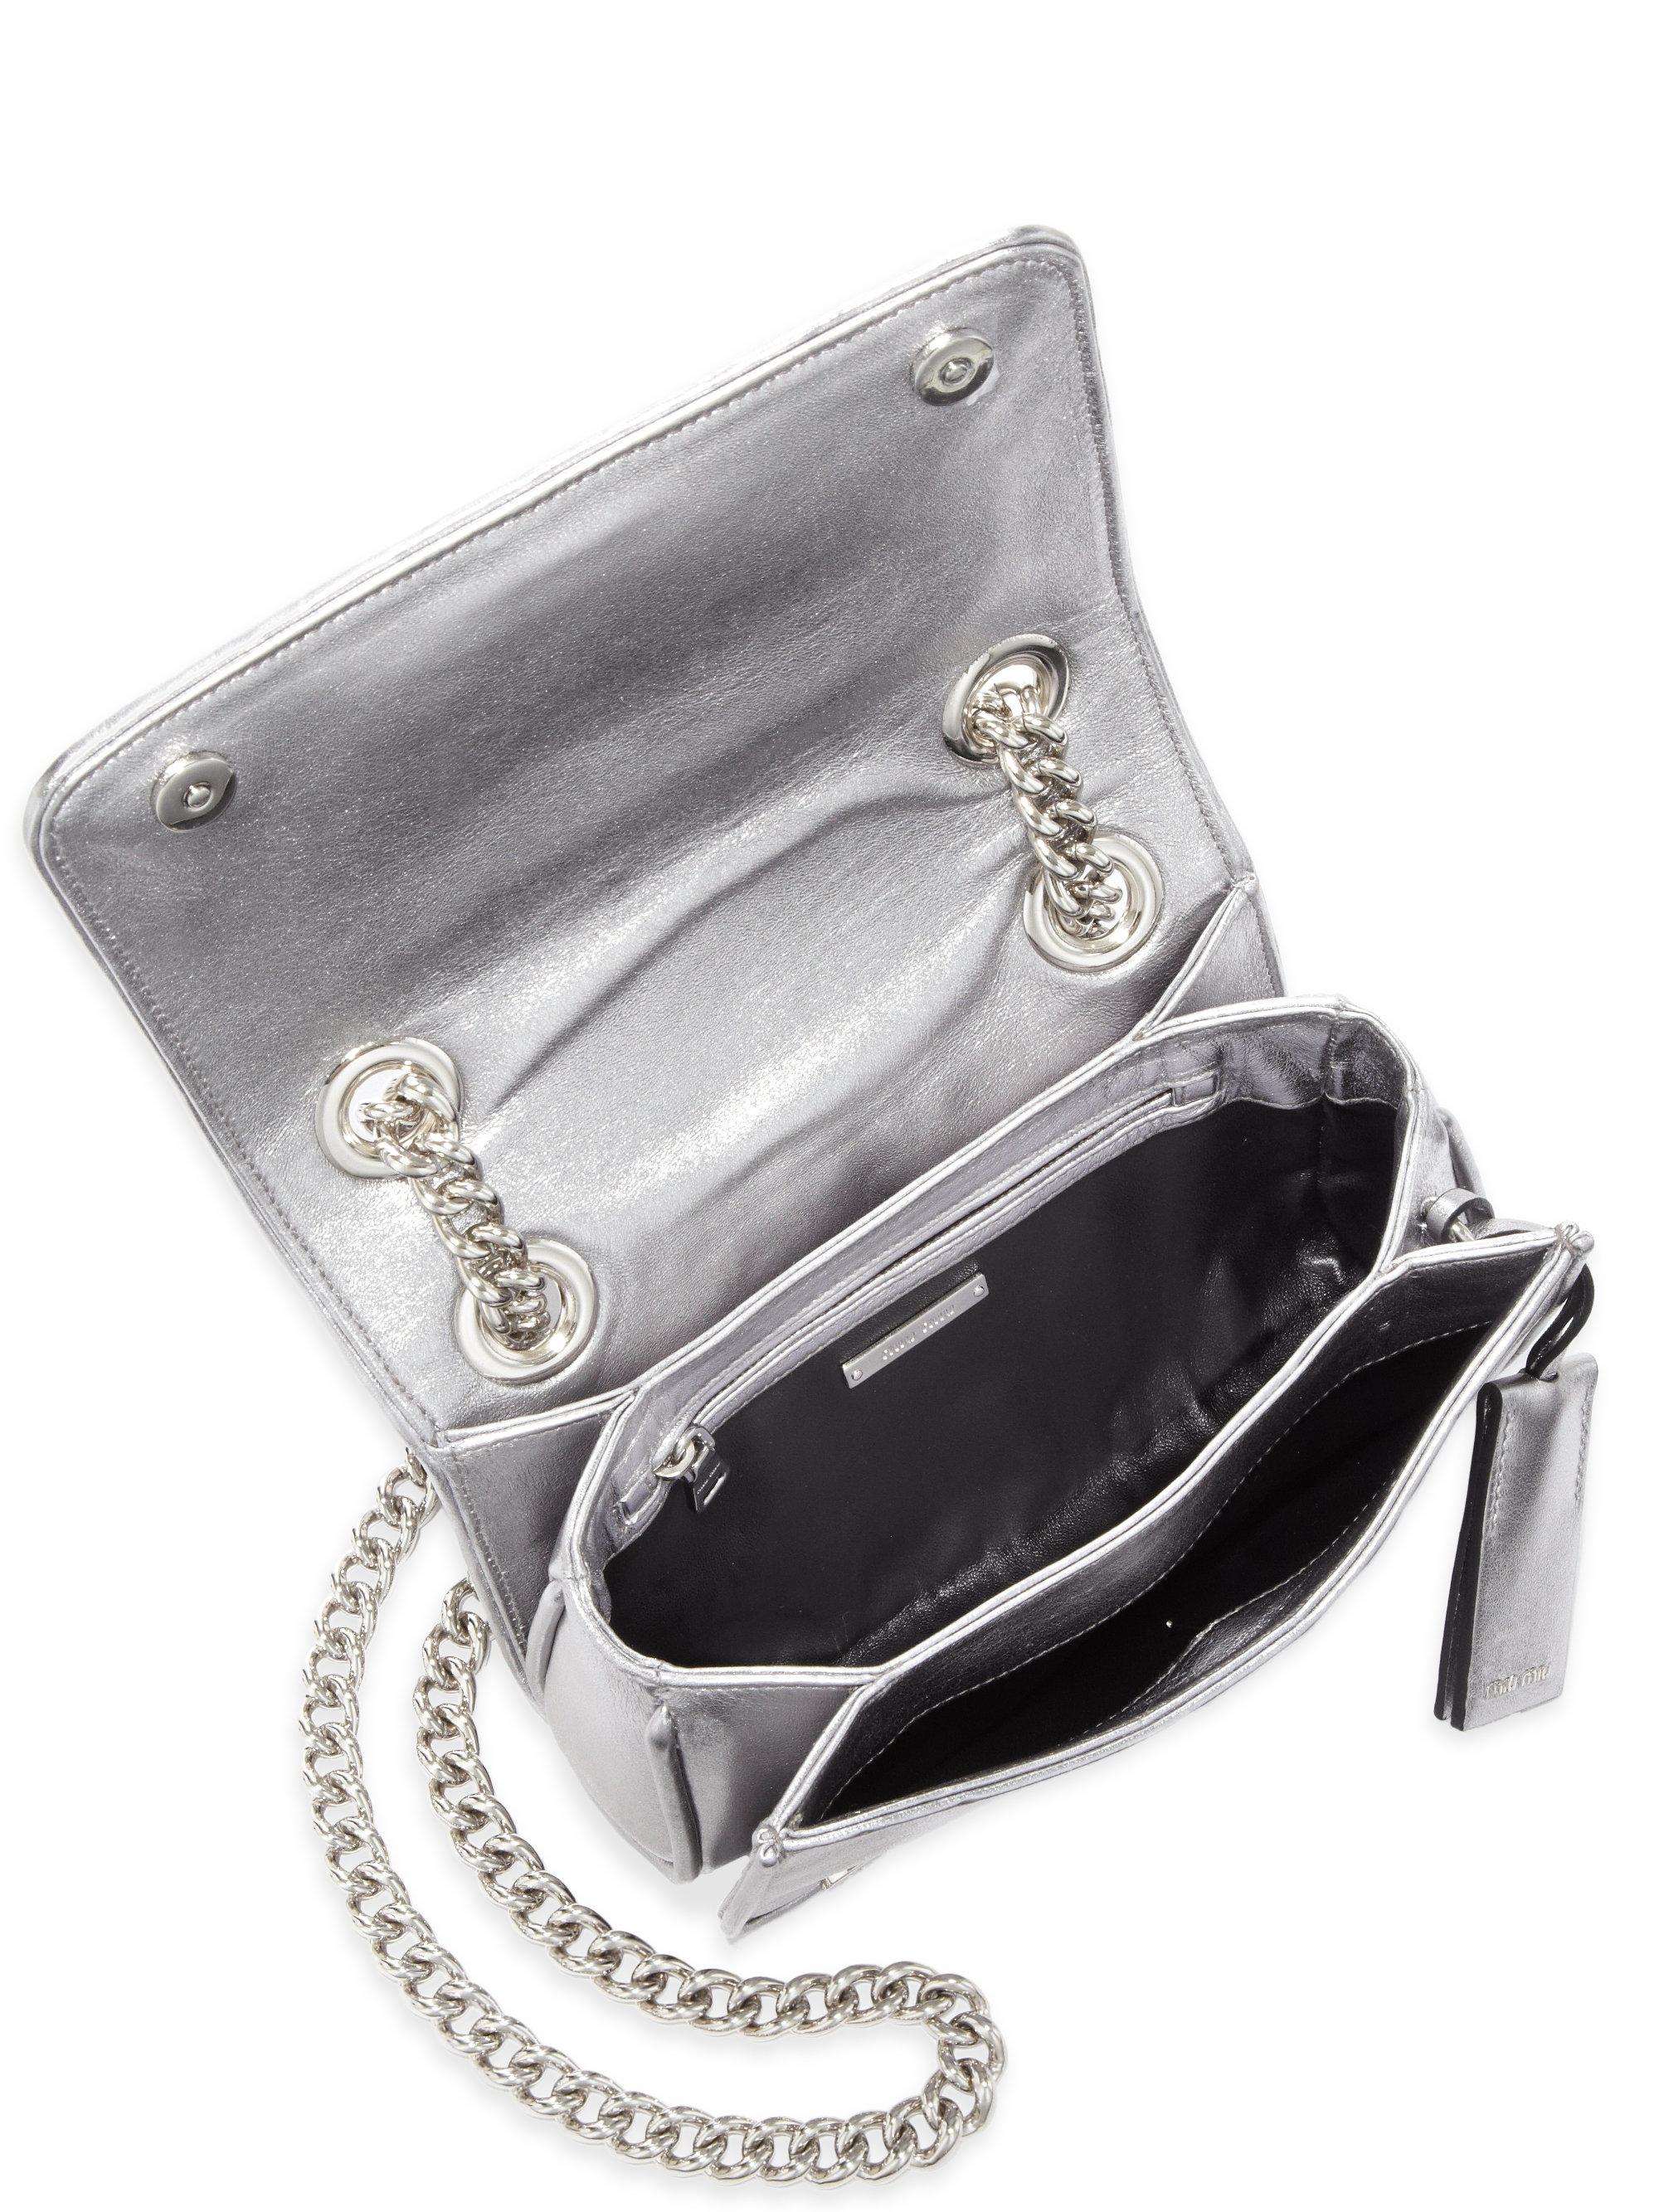 textured leather cross body bag - Metallic Miu Miu VP32QADRIS